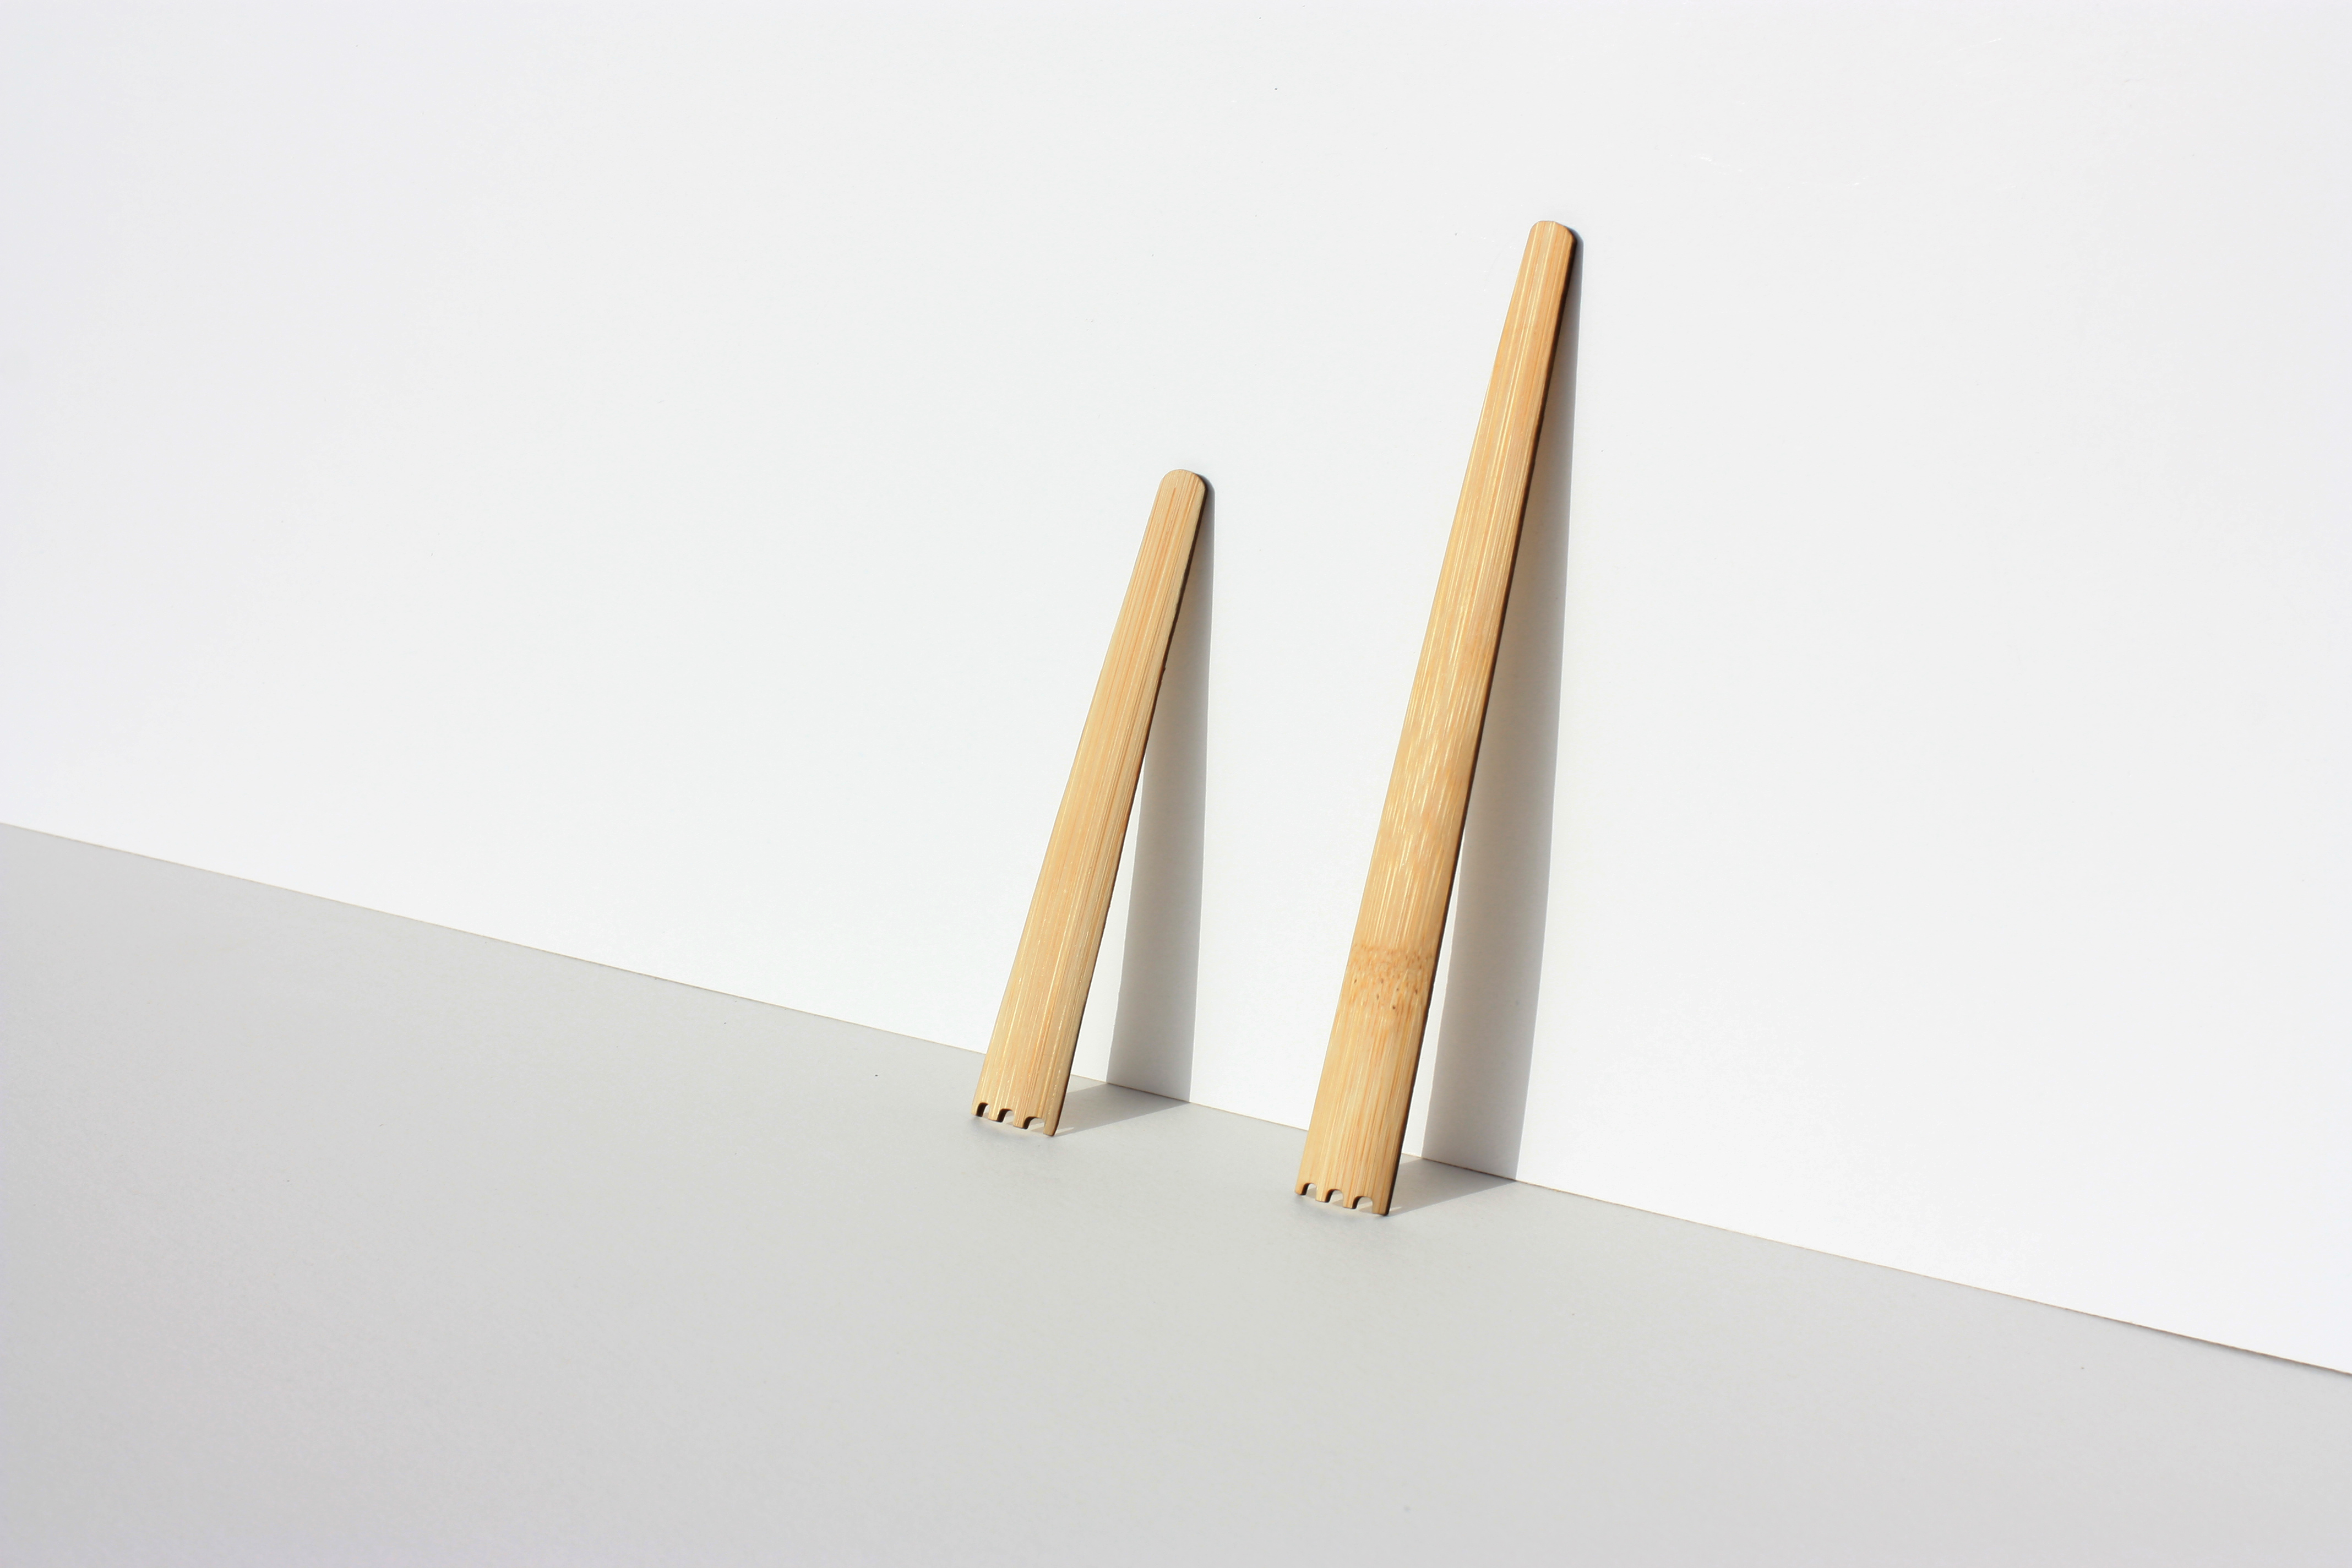 bamboe tonicstamper